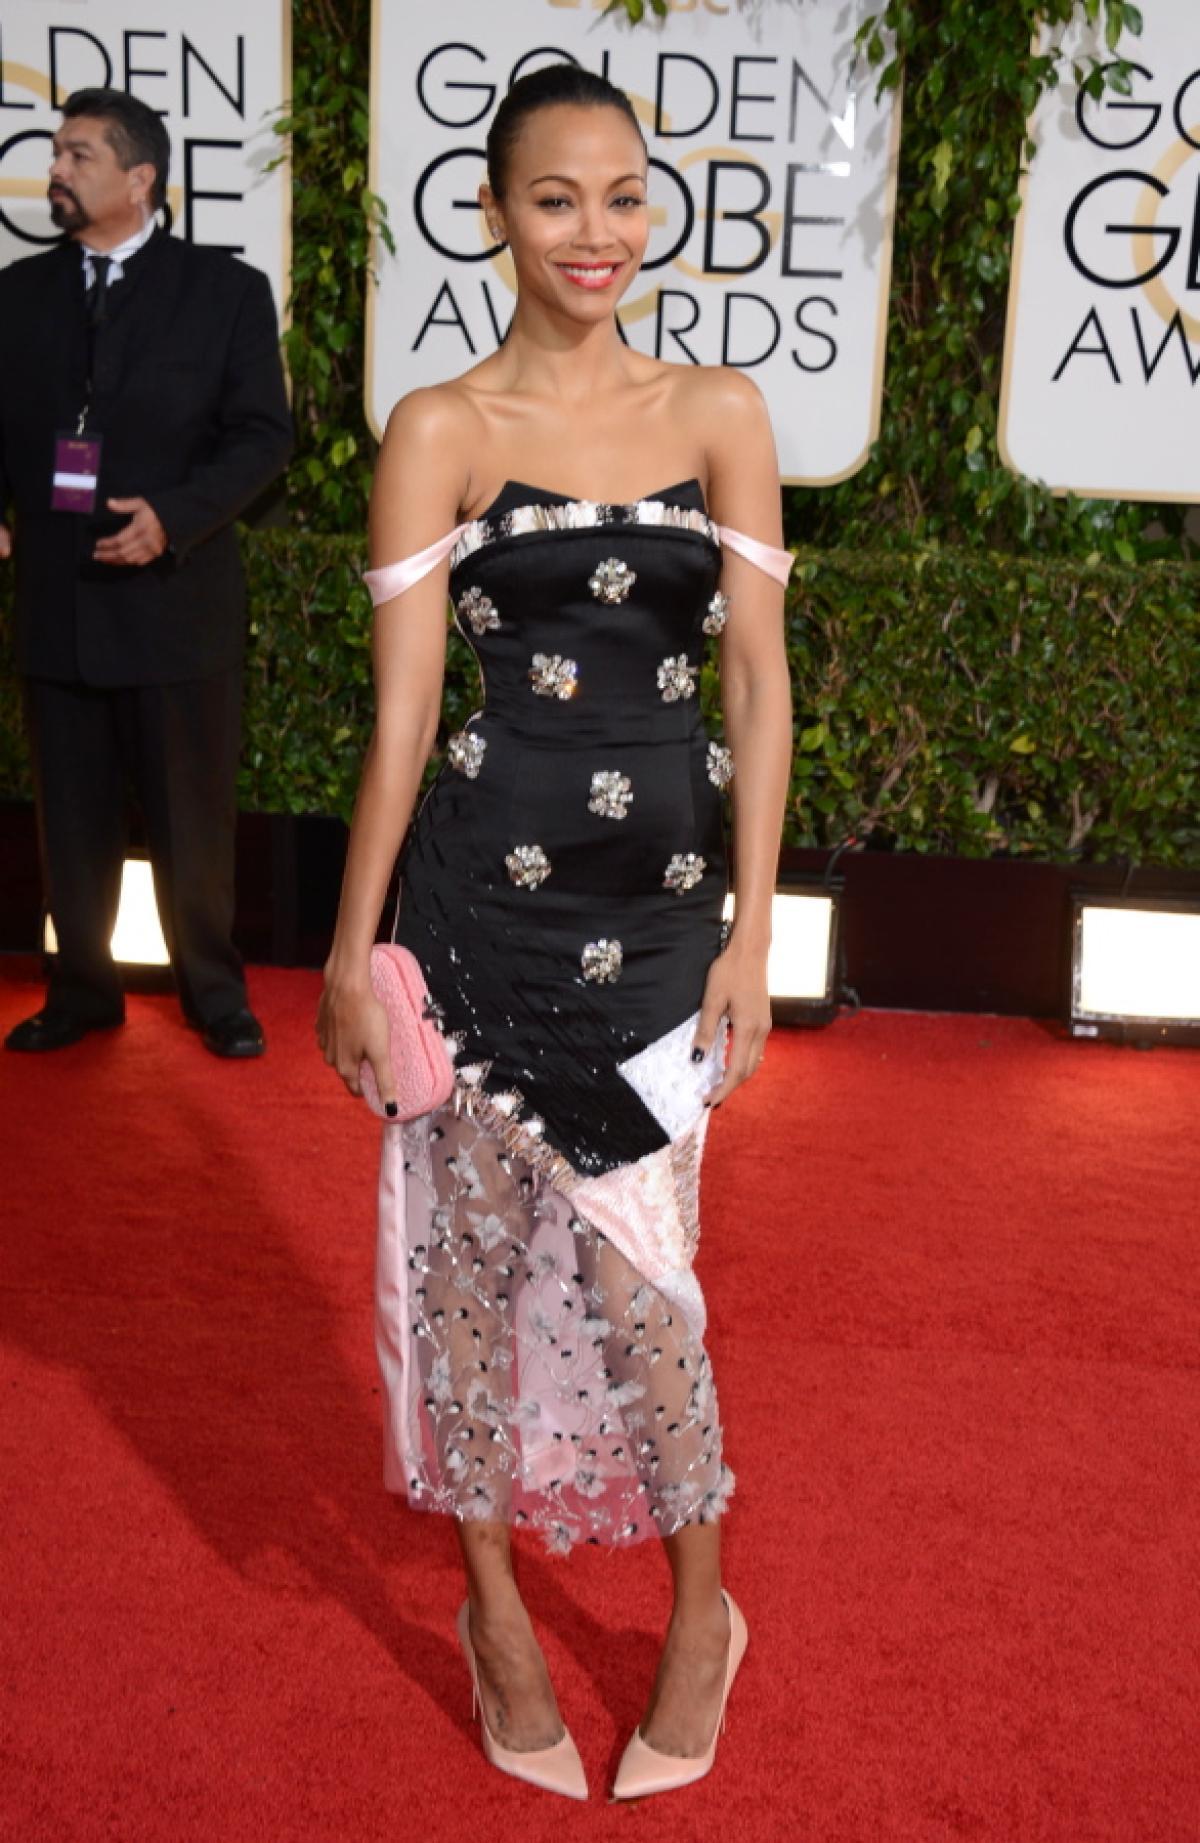 Golden Globes Red Carpet 2014 - Fashionsizzle